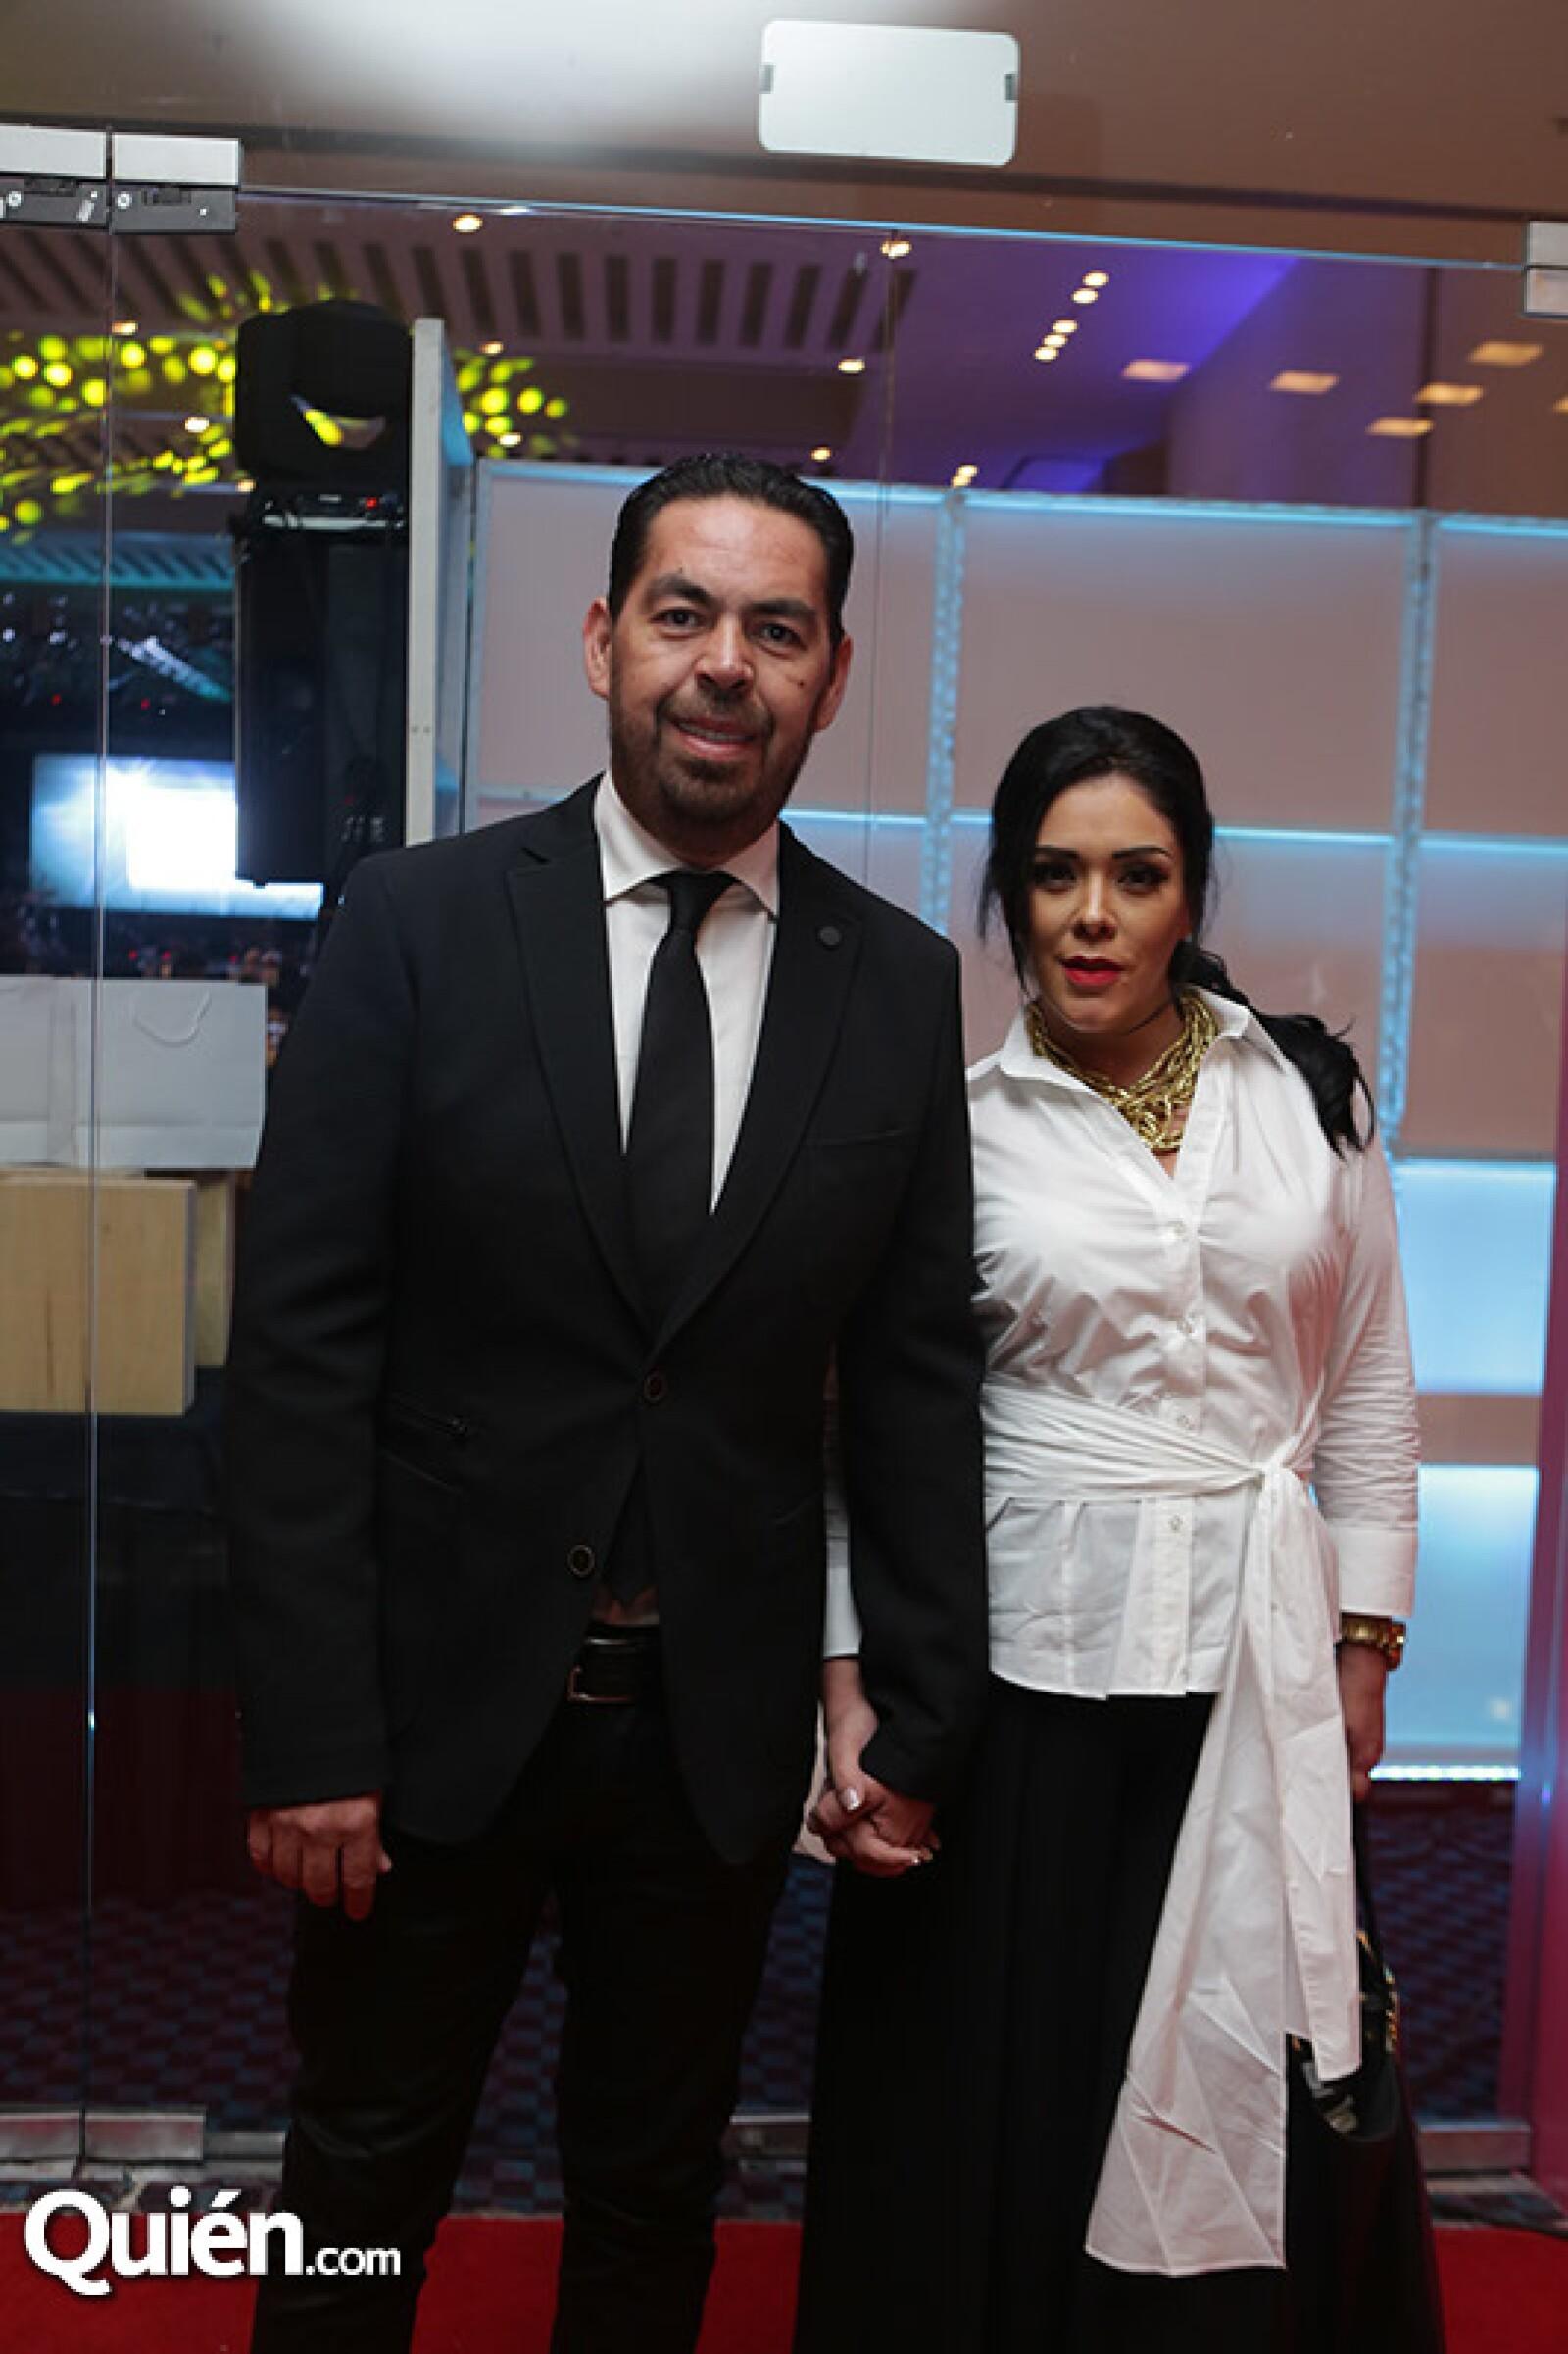 Jorge Dalessio y Marichelo Puente